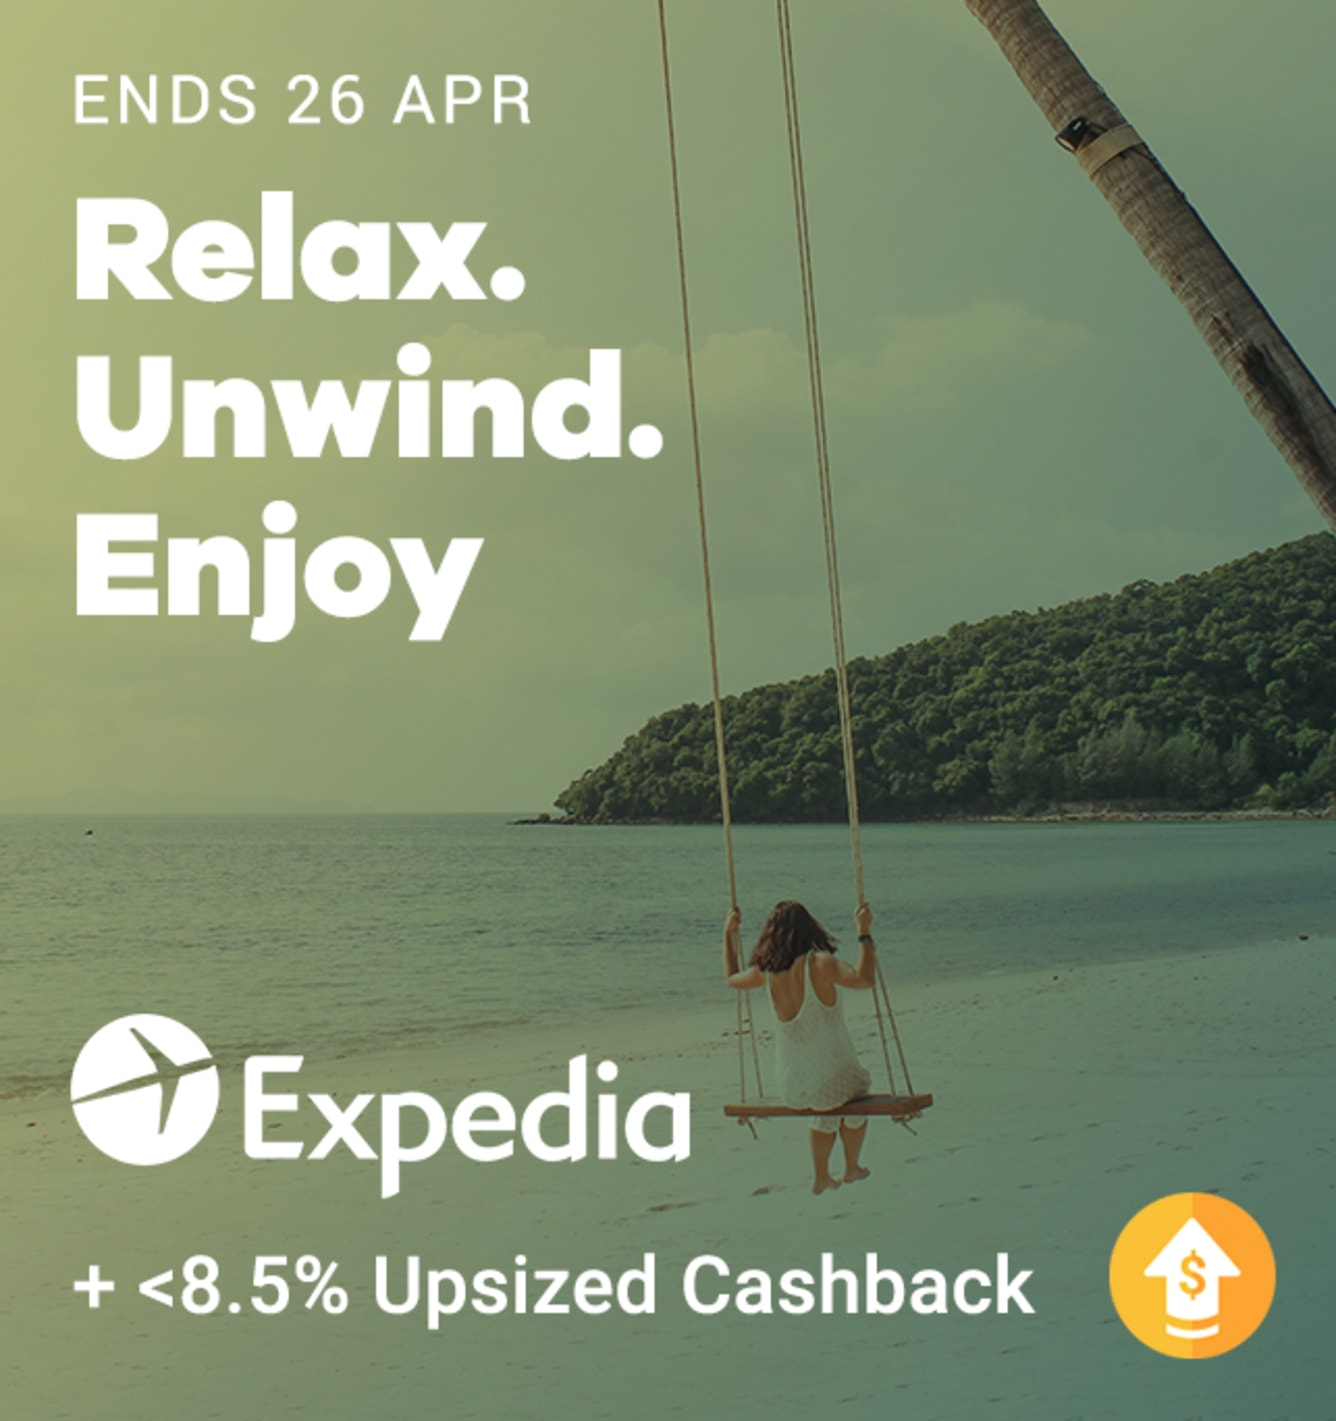 Expedia <8.5% April 2019